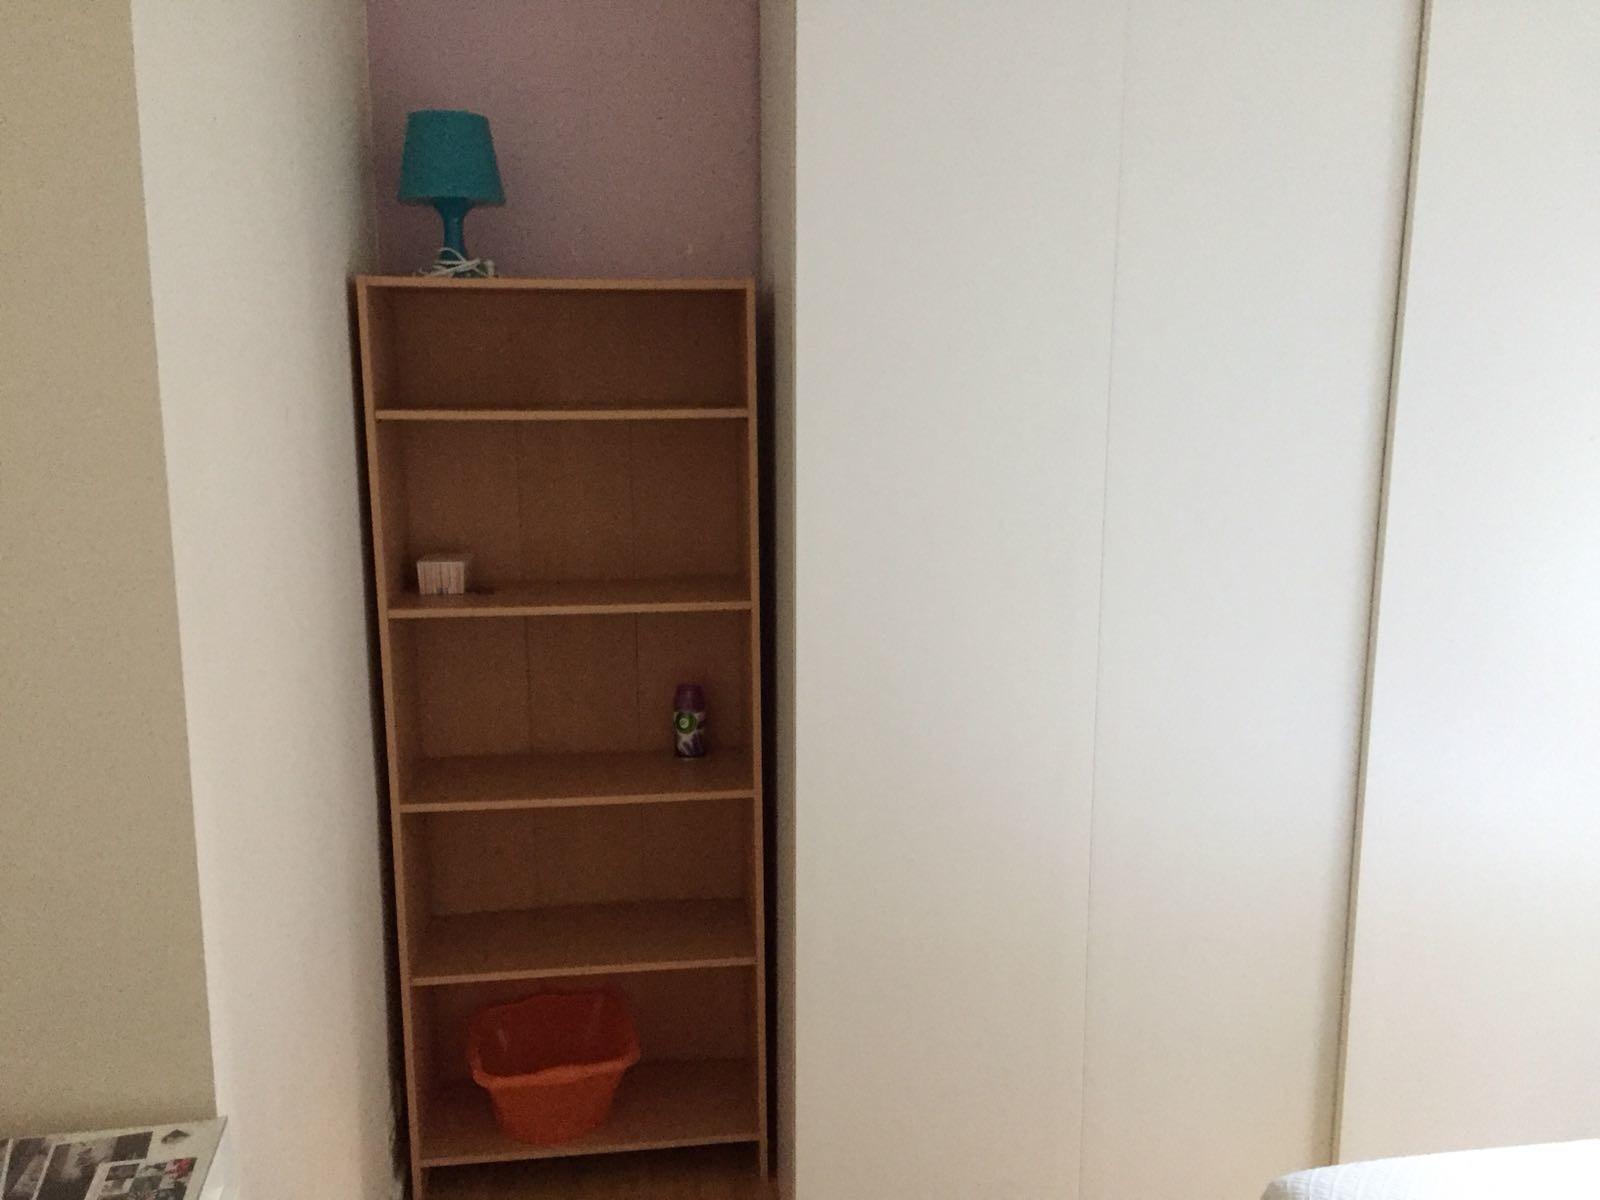 Meuble Micro Onde Ikea chambre meublée dans grand appartement à etterbeek - 640euro